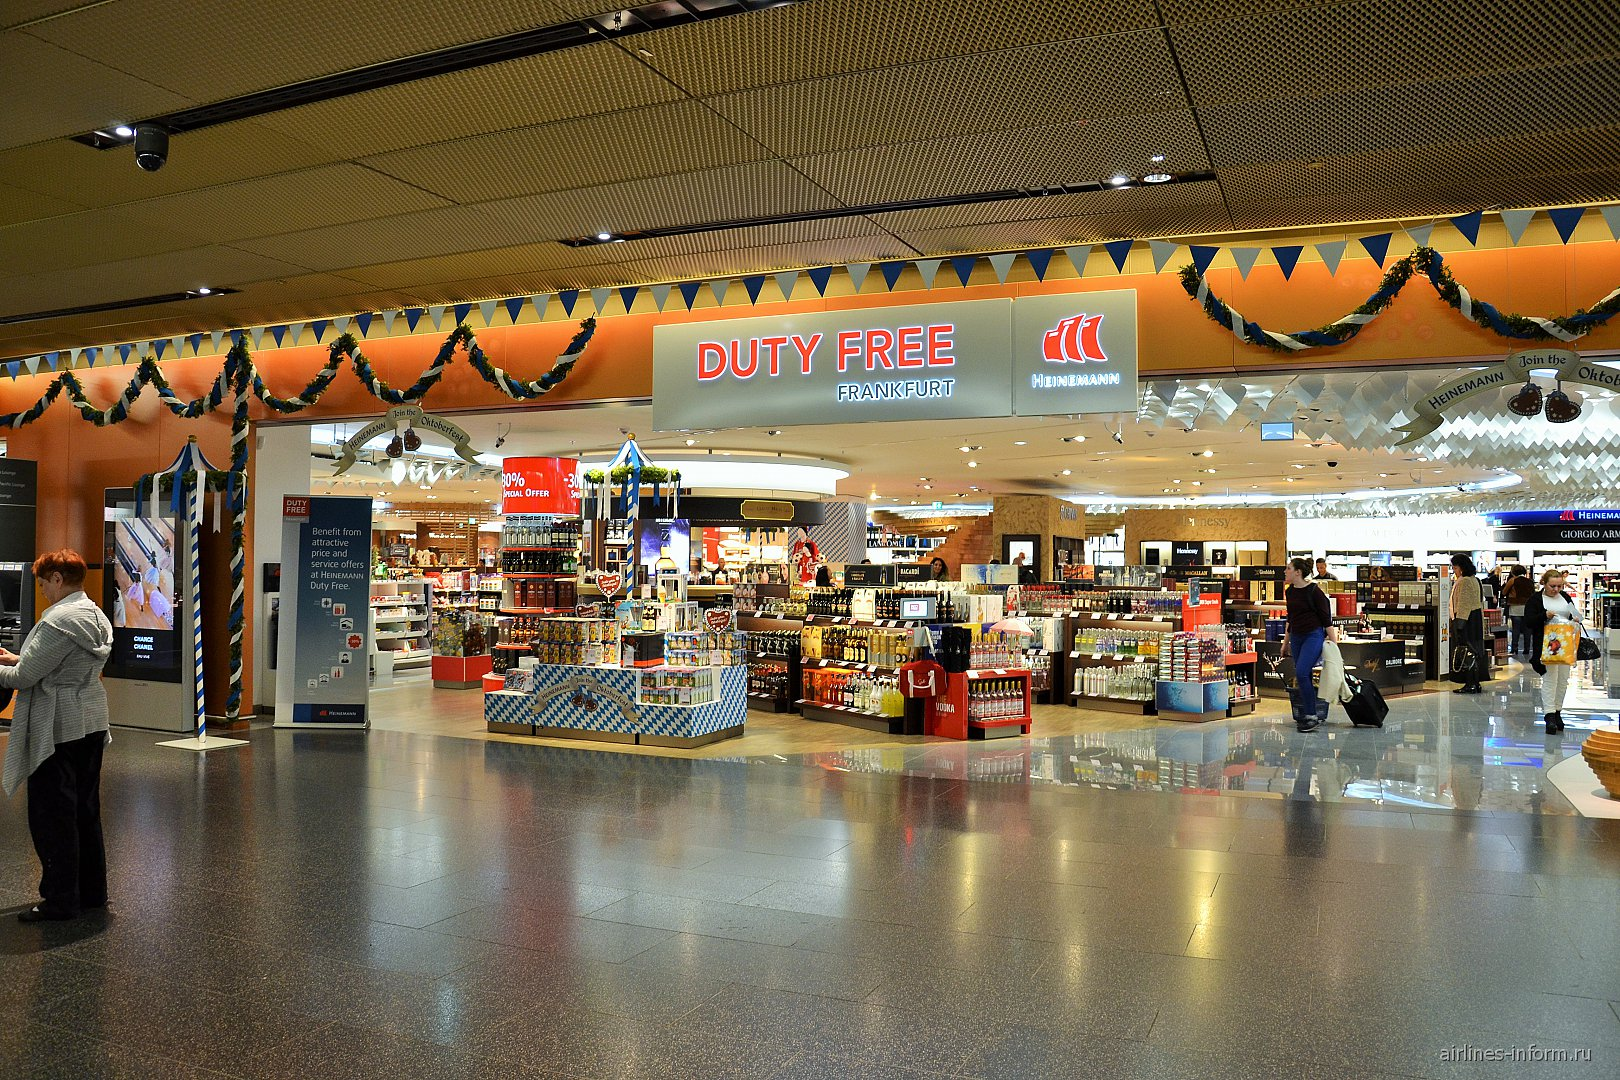 Магазин Duty Free в терминале 1 аэропорта Франкфурт